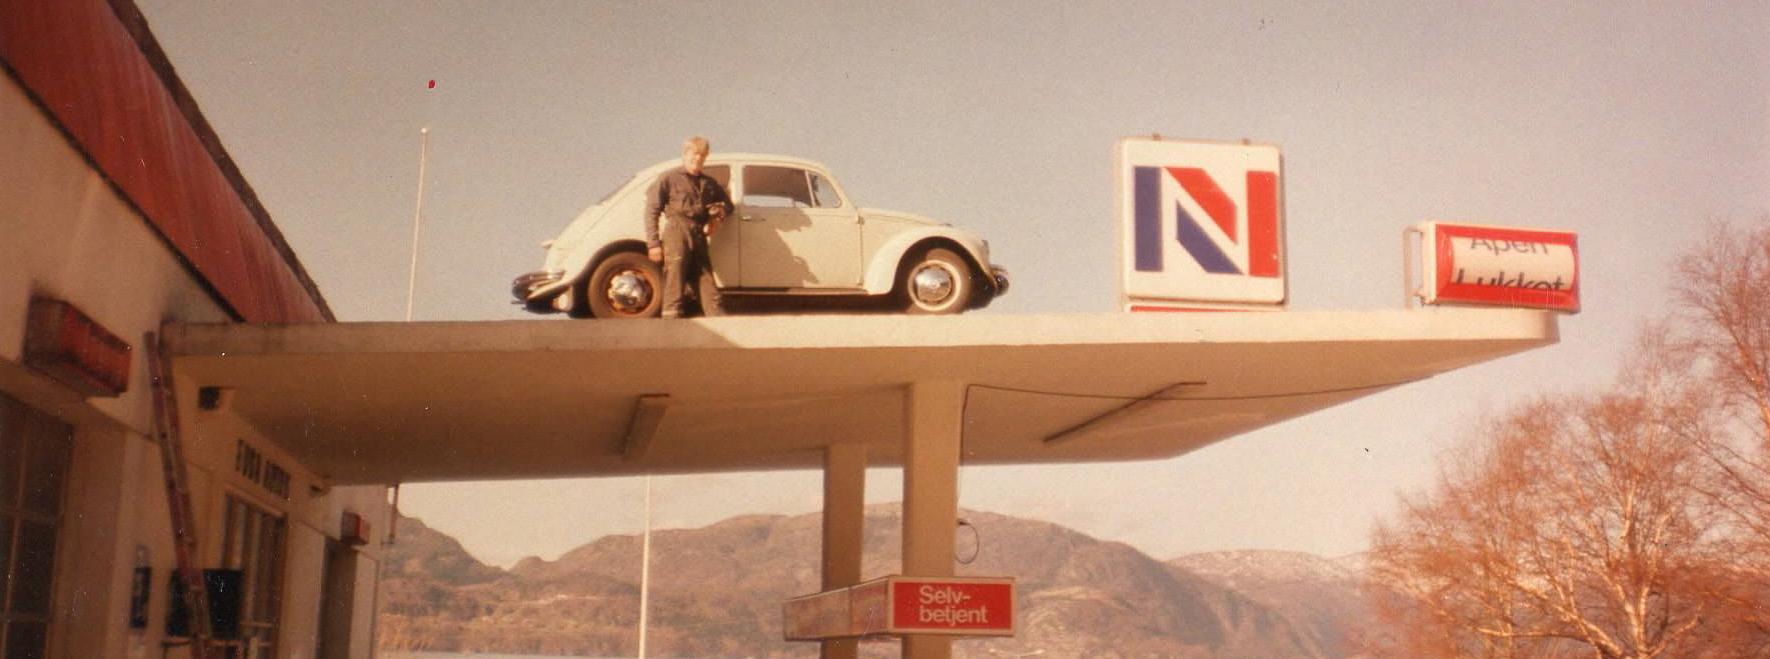 Fusa Auto - 1988